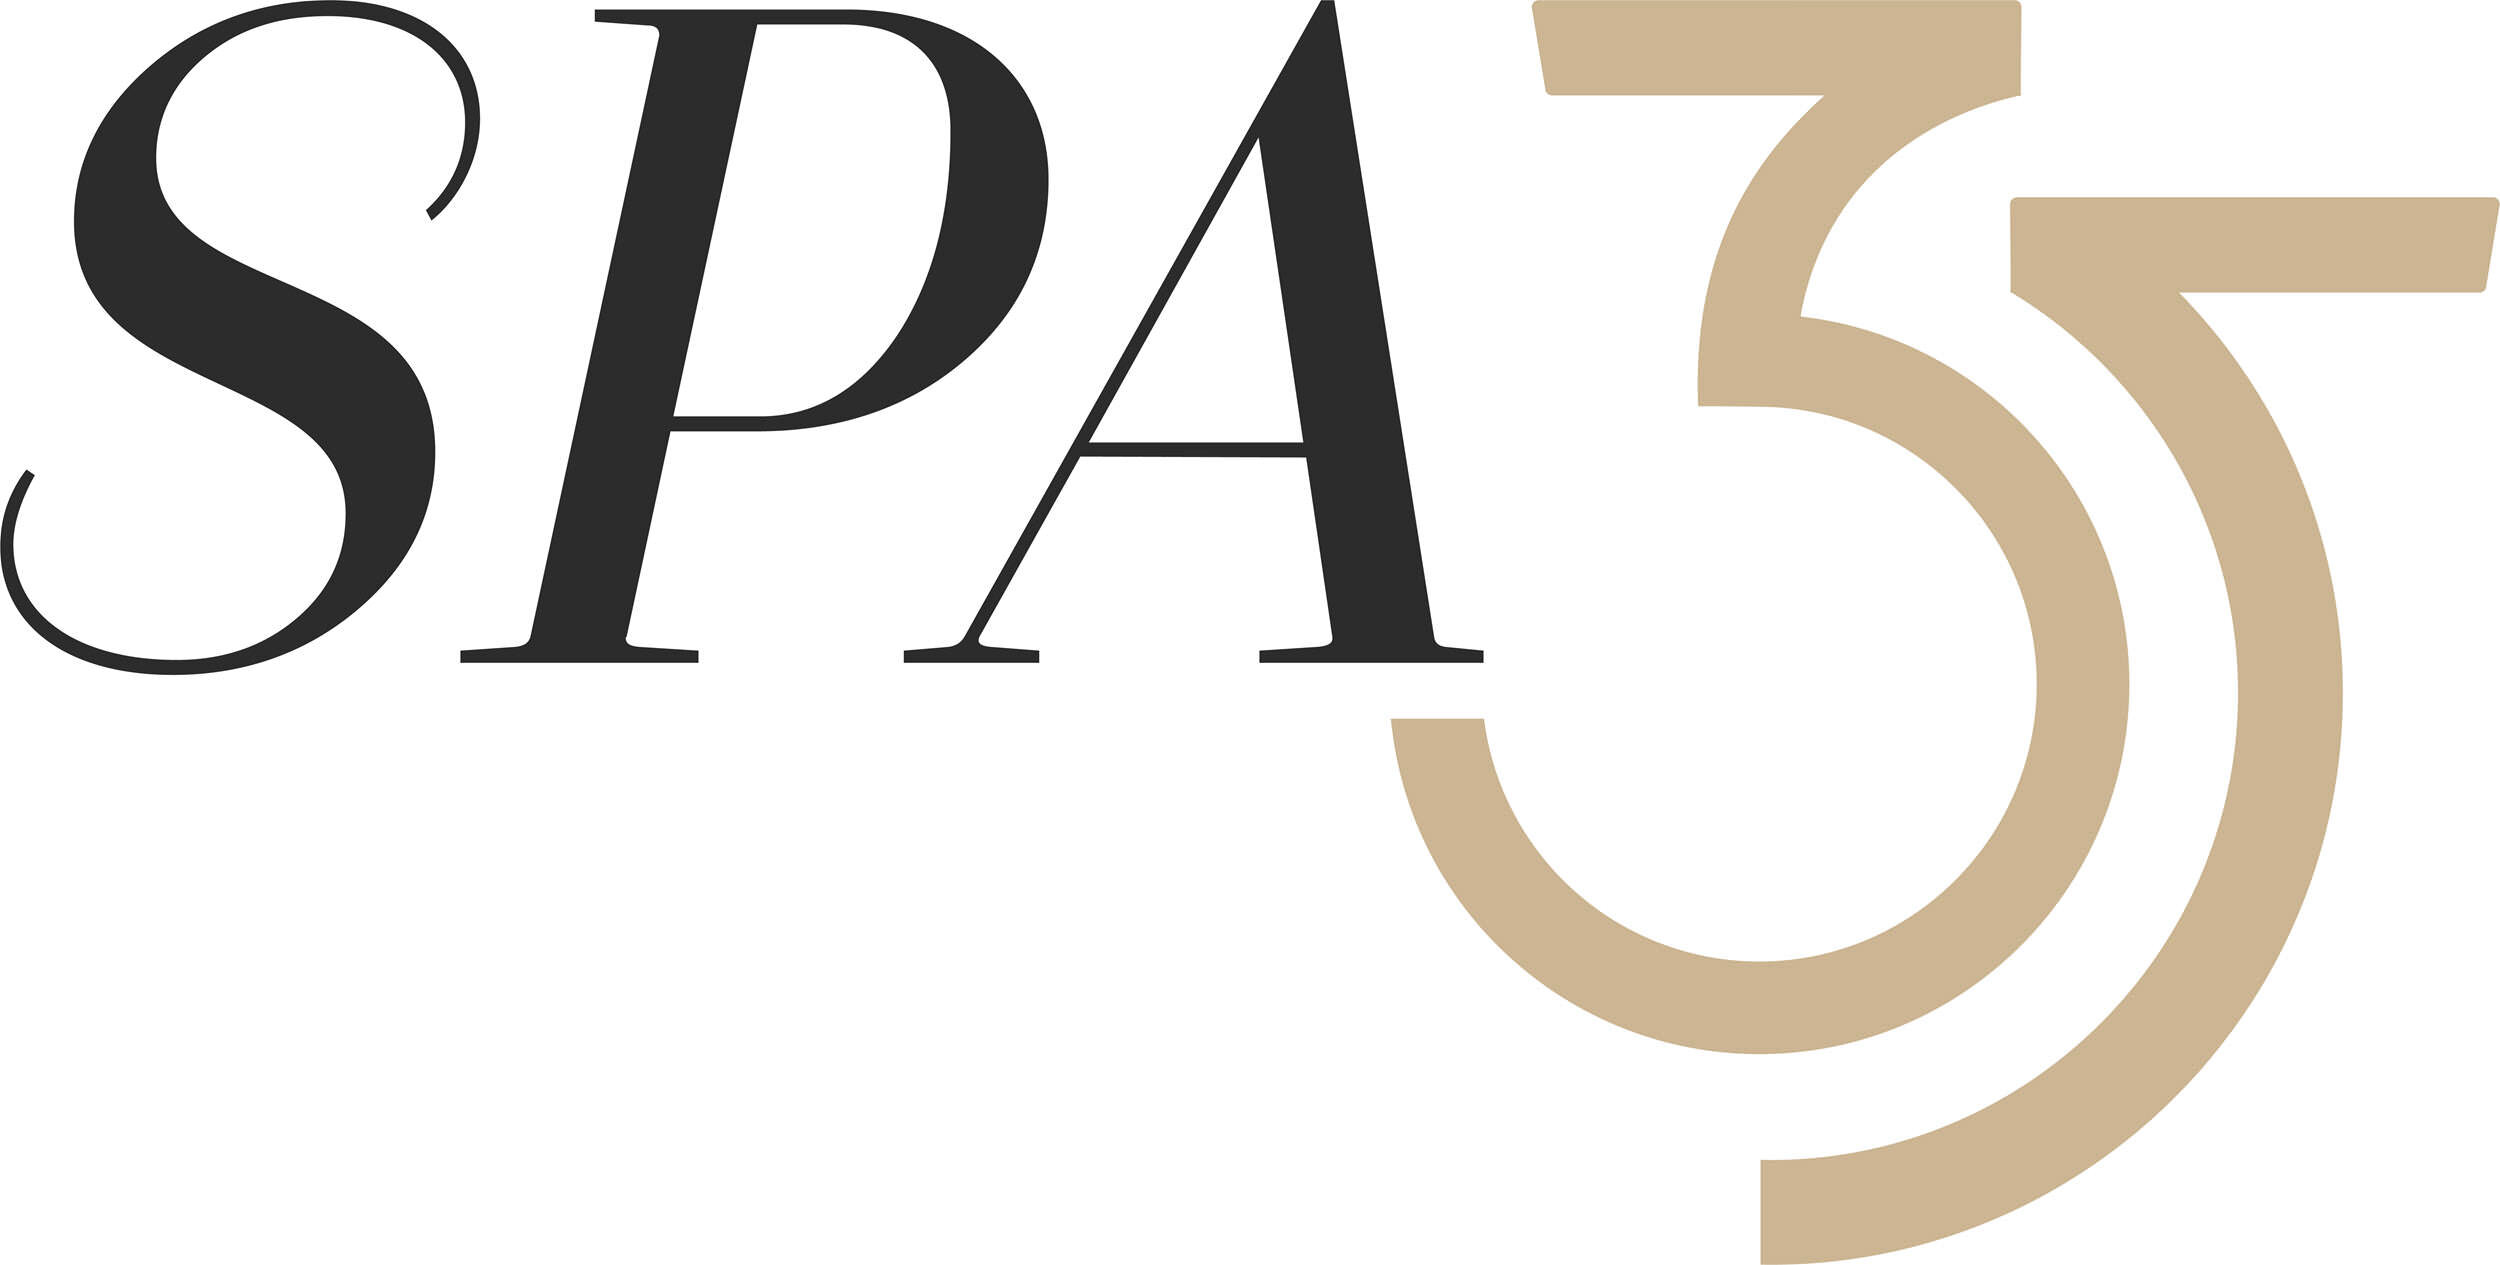 Spa 35 team members, registered nurses, nurse practitioners,